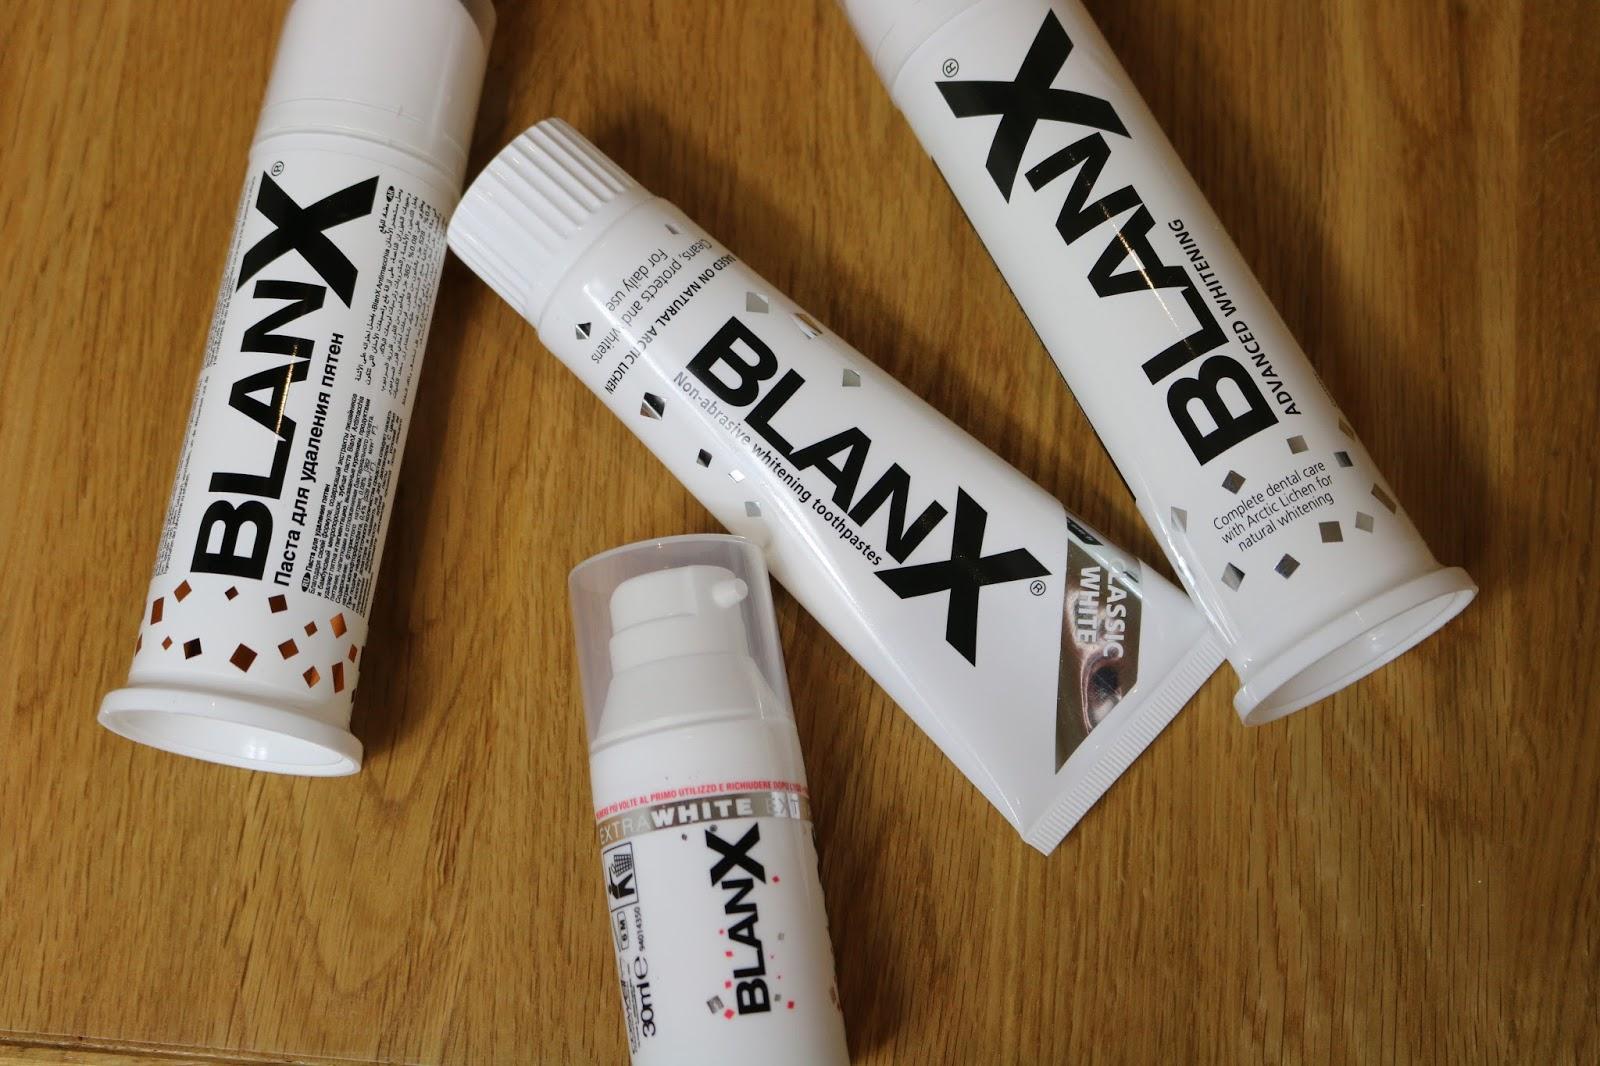 Blanx teeth whitening